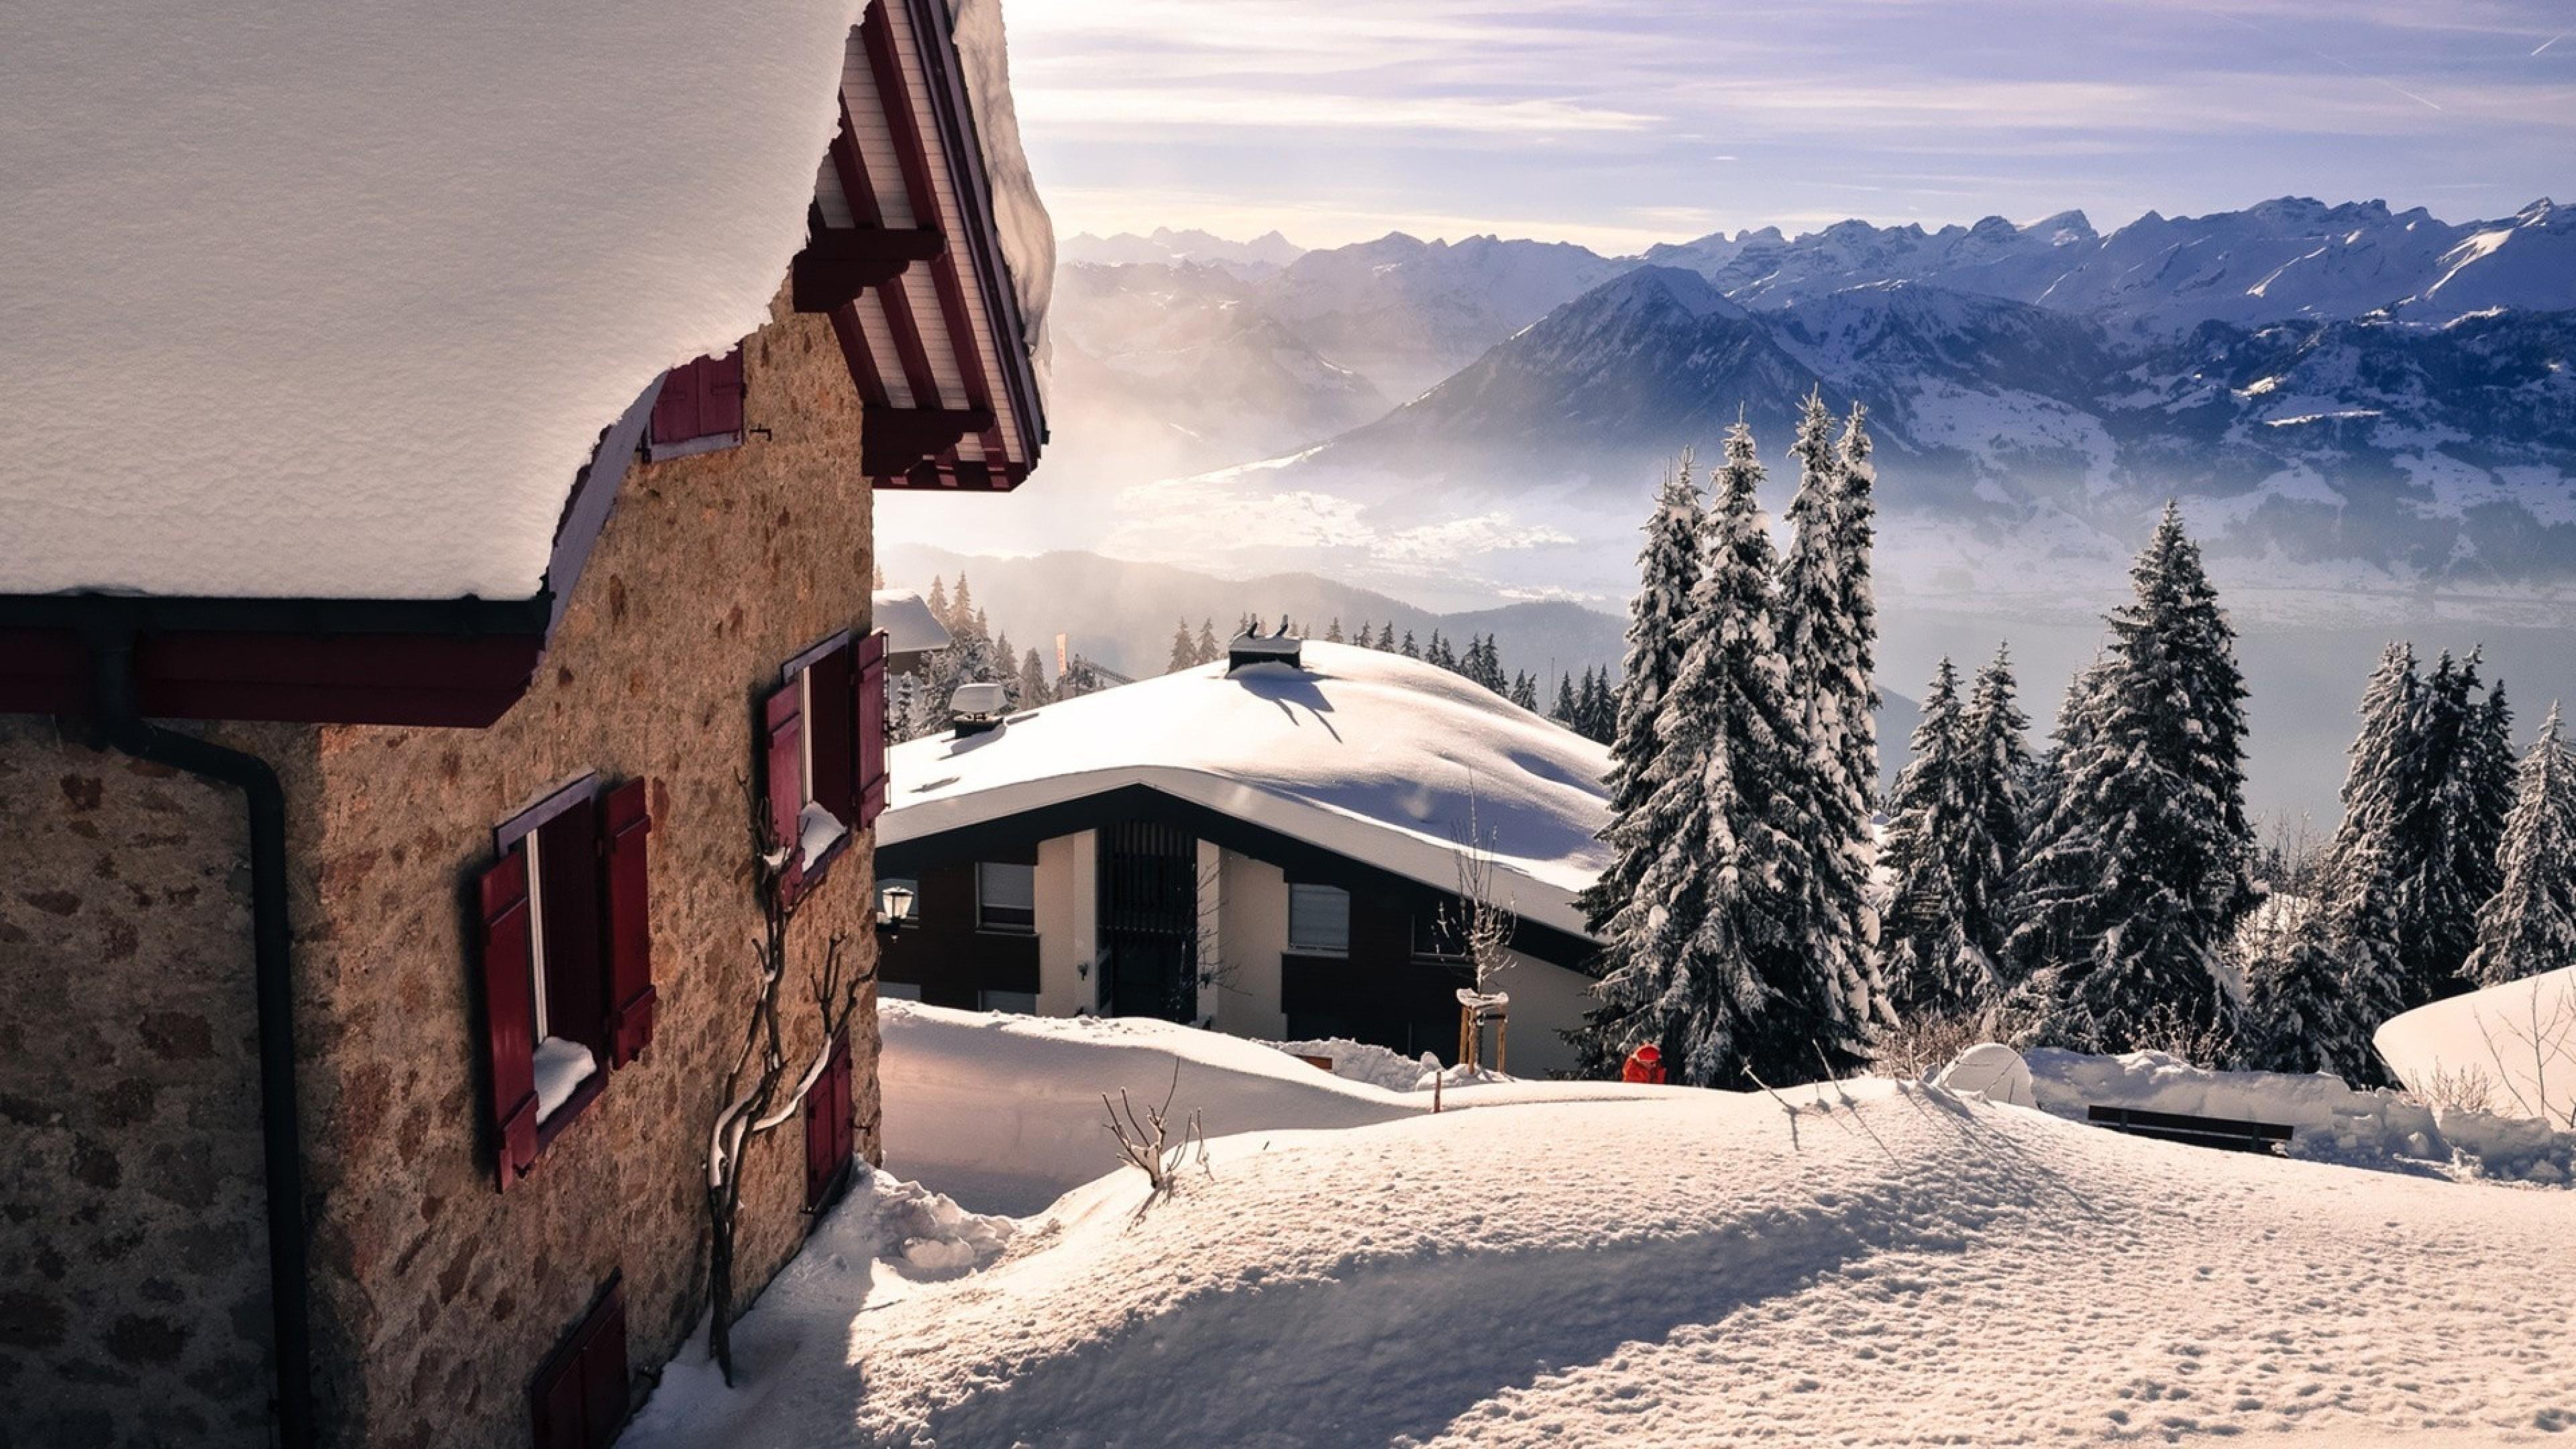 Res: 3840x2160, Snow mountains winter wallpaper HD.